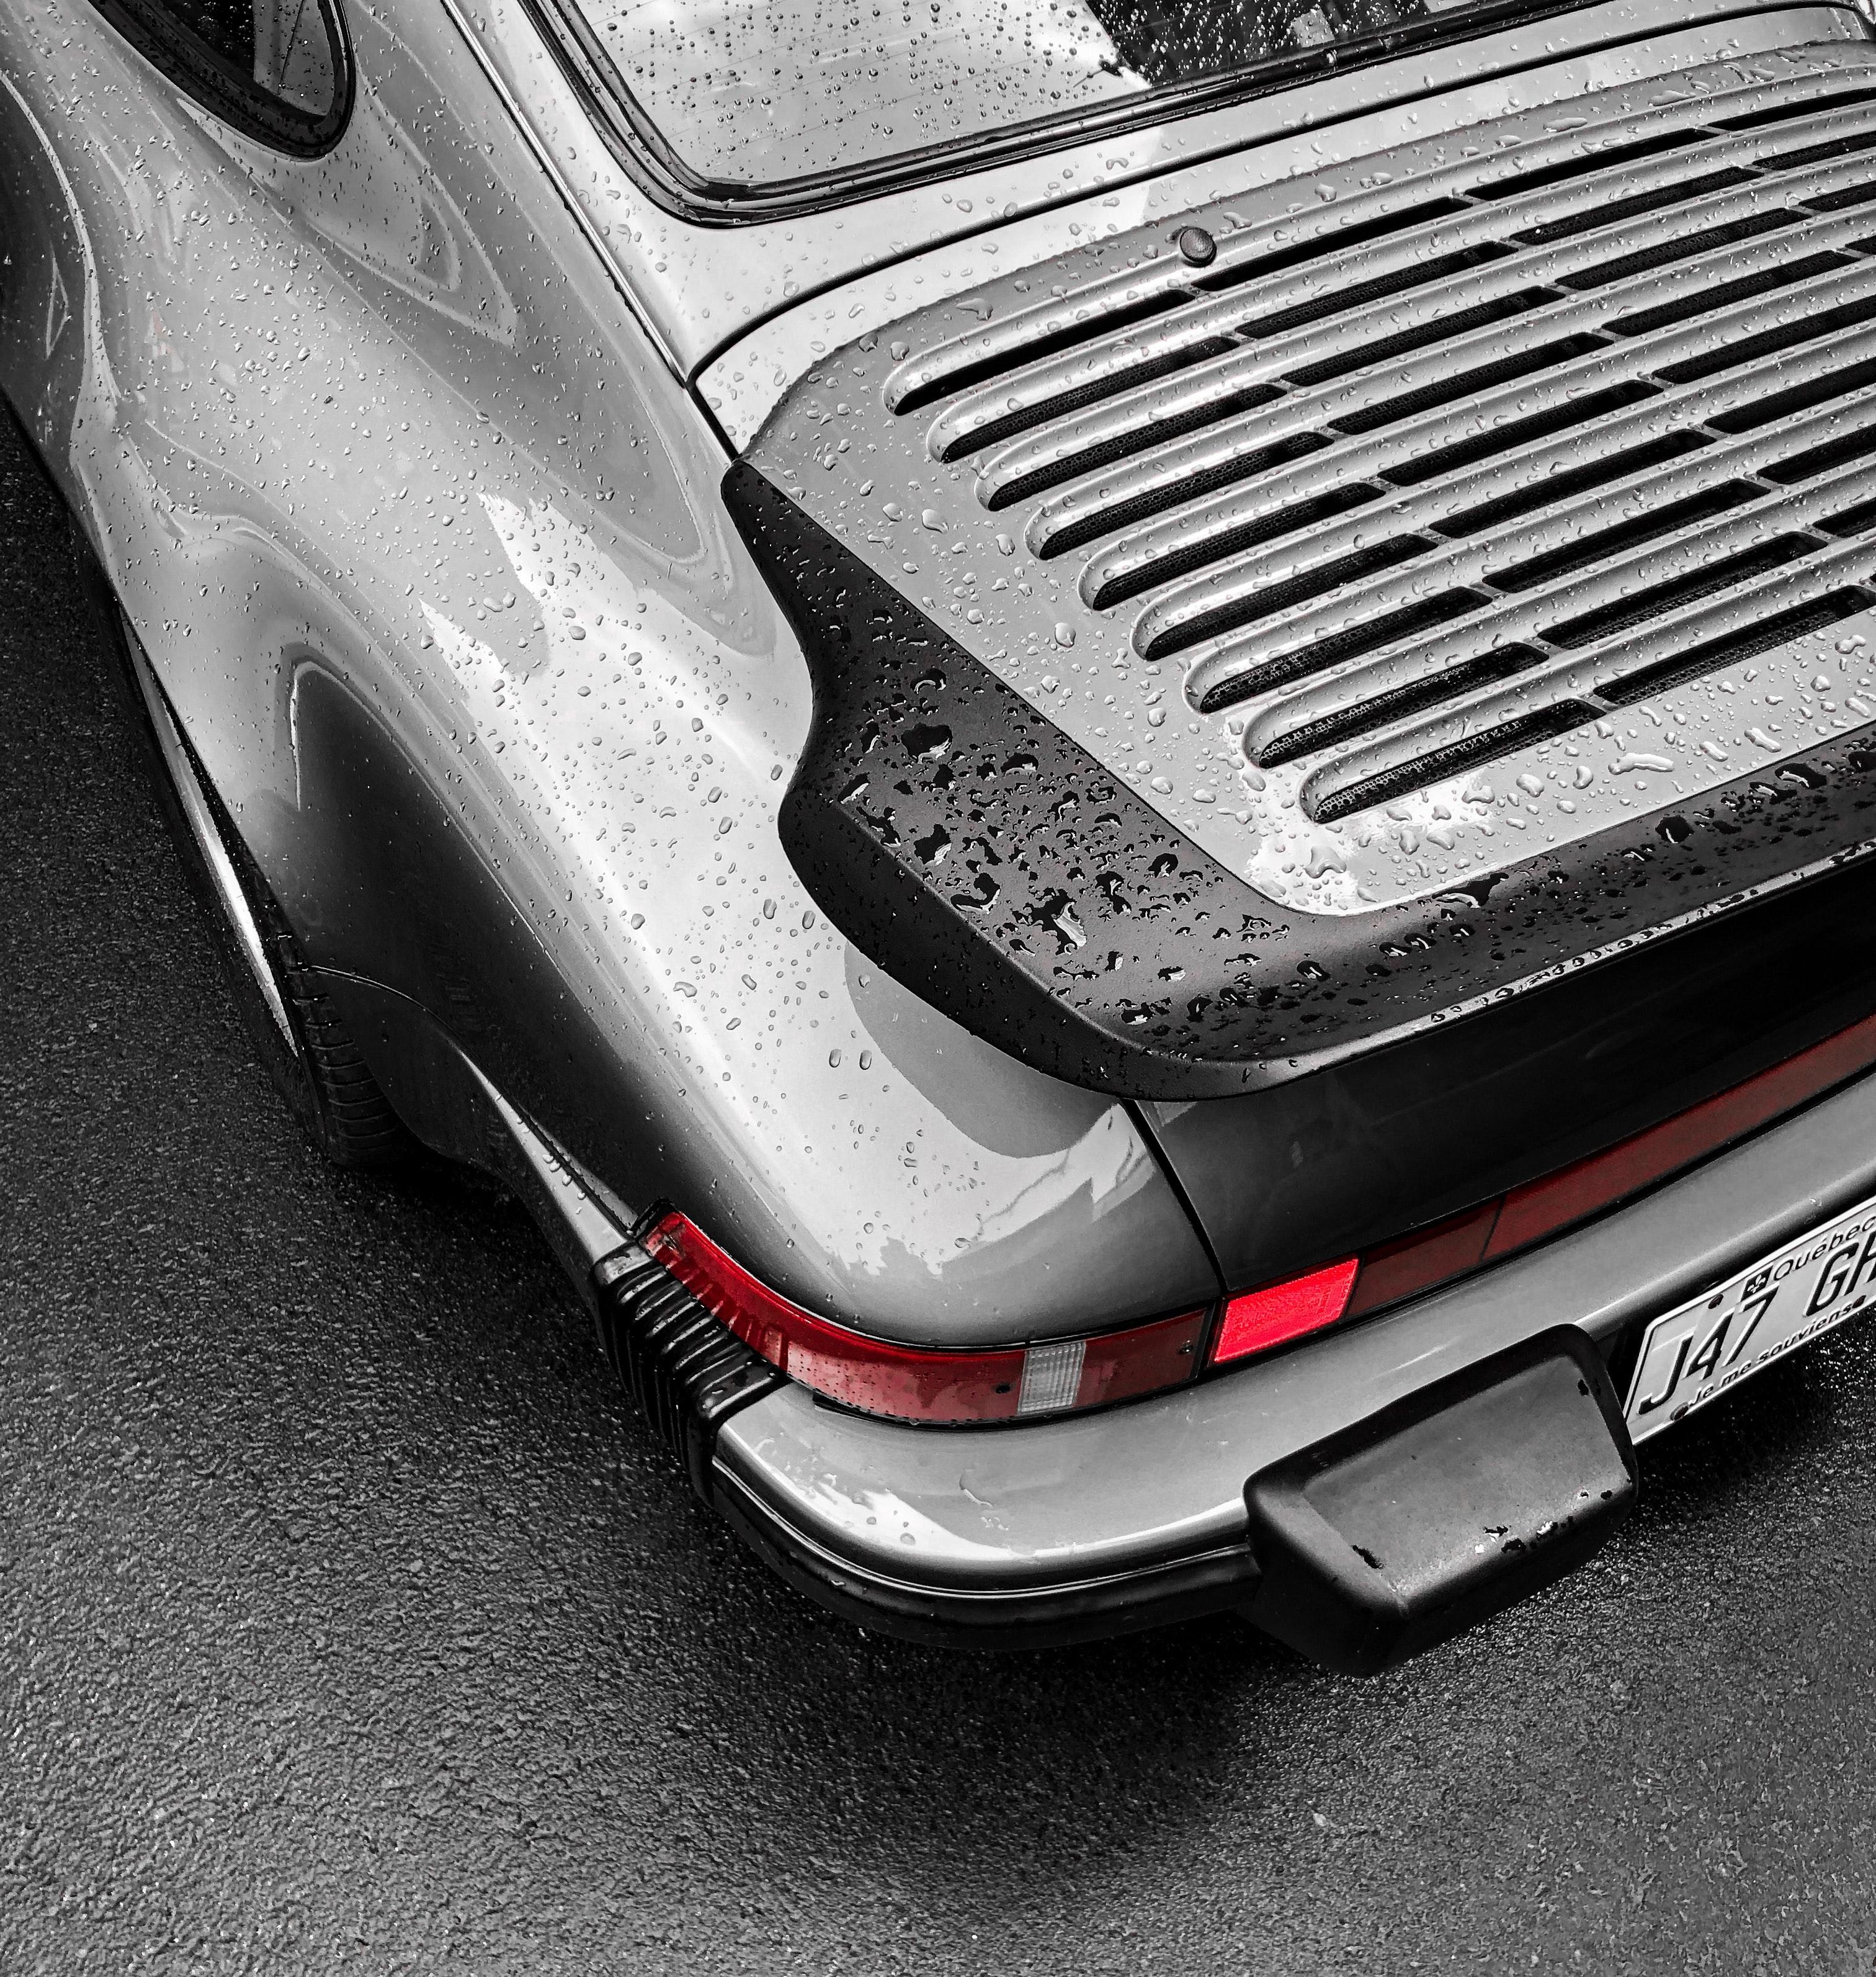 Old Porsche Pictures Download Free Images On Unsplash